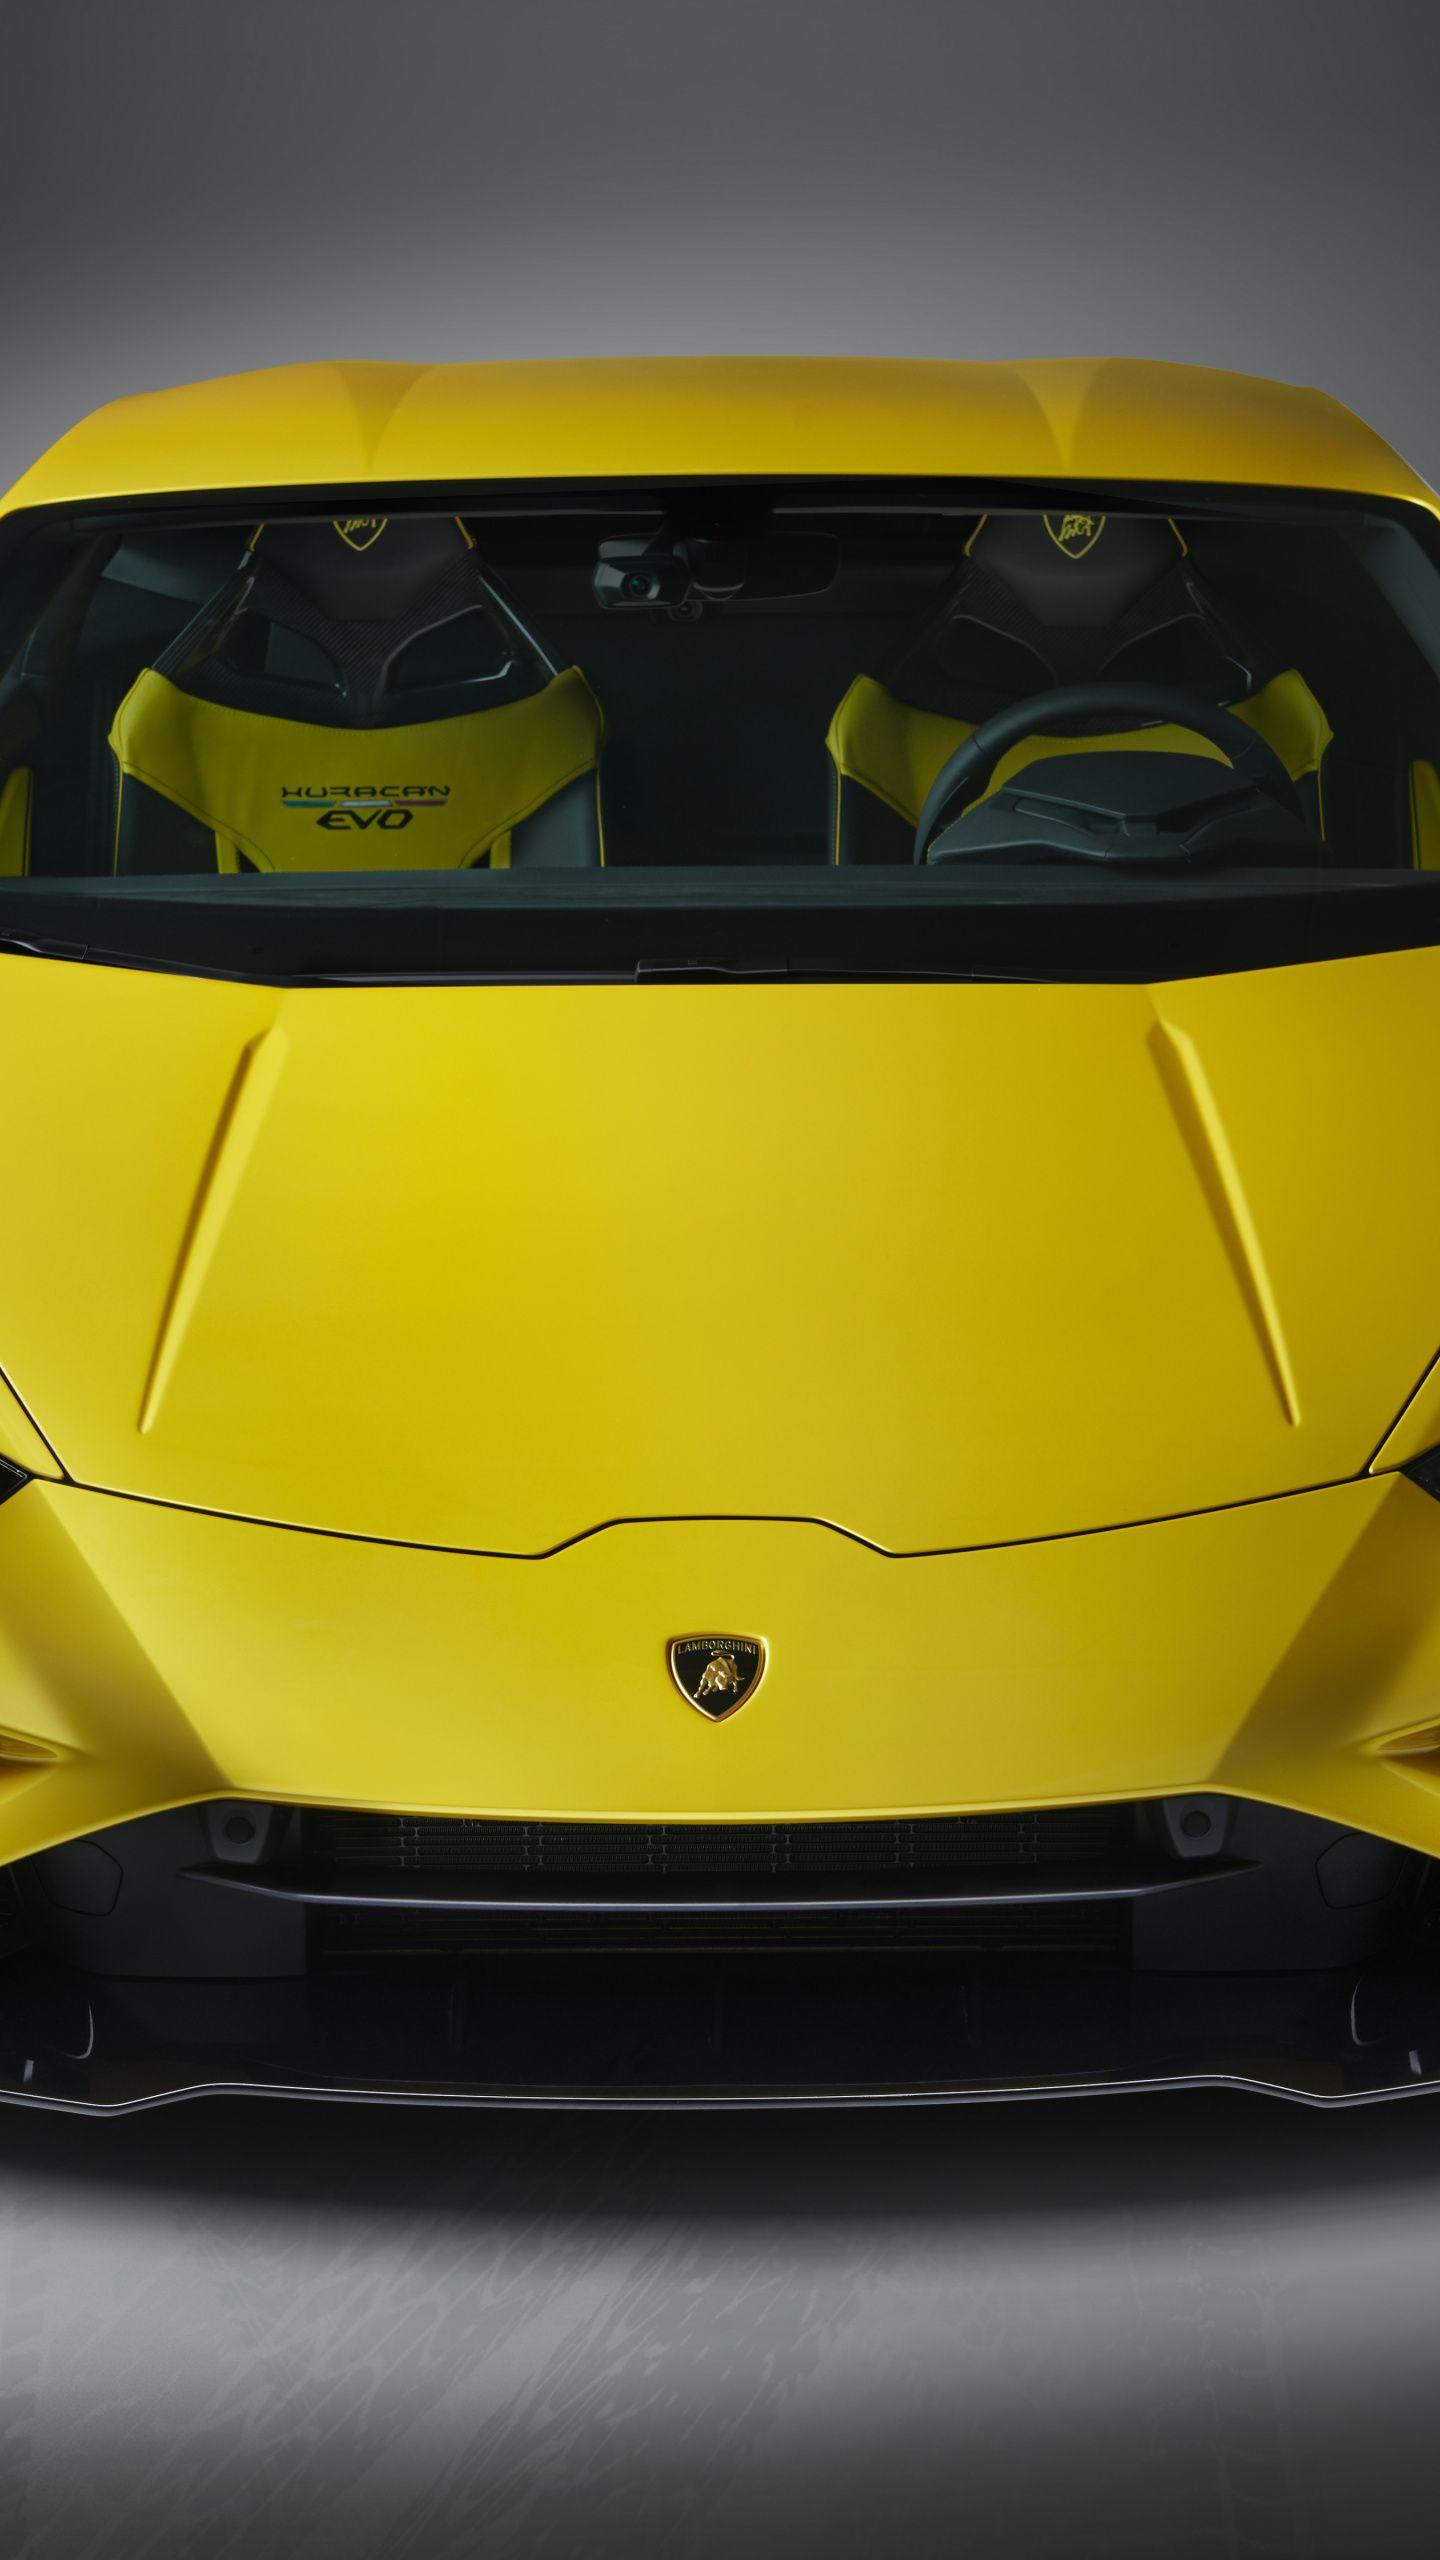 1440x2560 Car Lamborghini Huracan Evo Yellow Car Wallpaper In